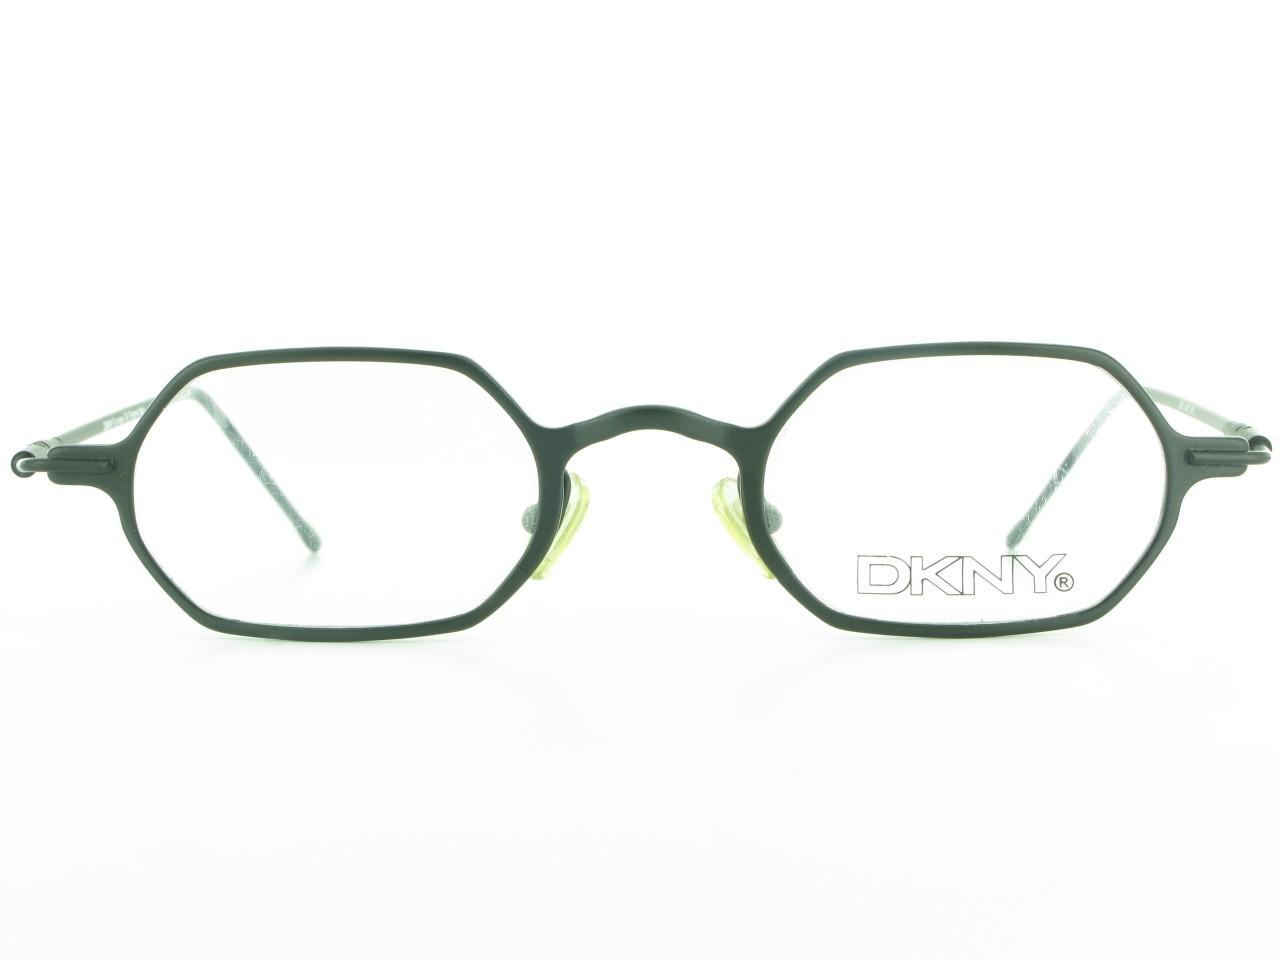 Square Designer Eyeglass Frames : DKNY Burney 366 Small Black Square Metal Womens Retro ...